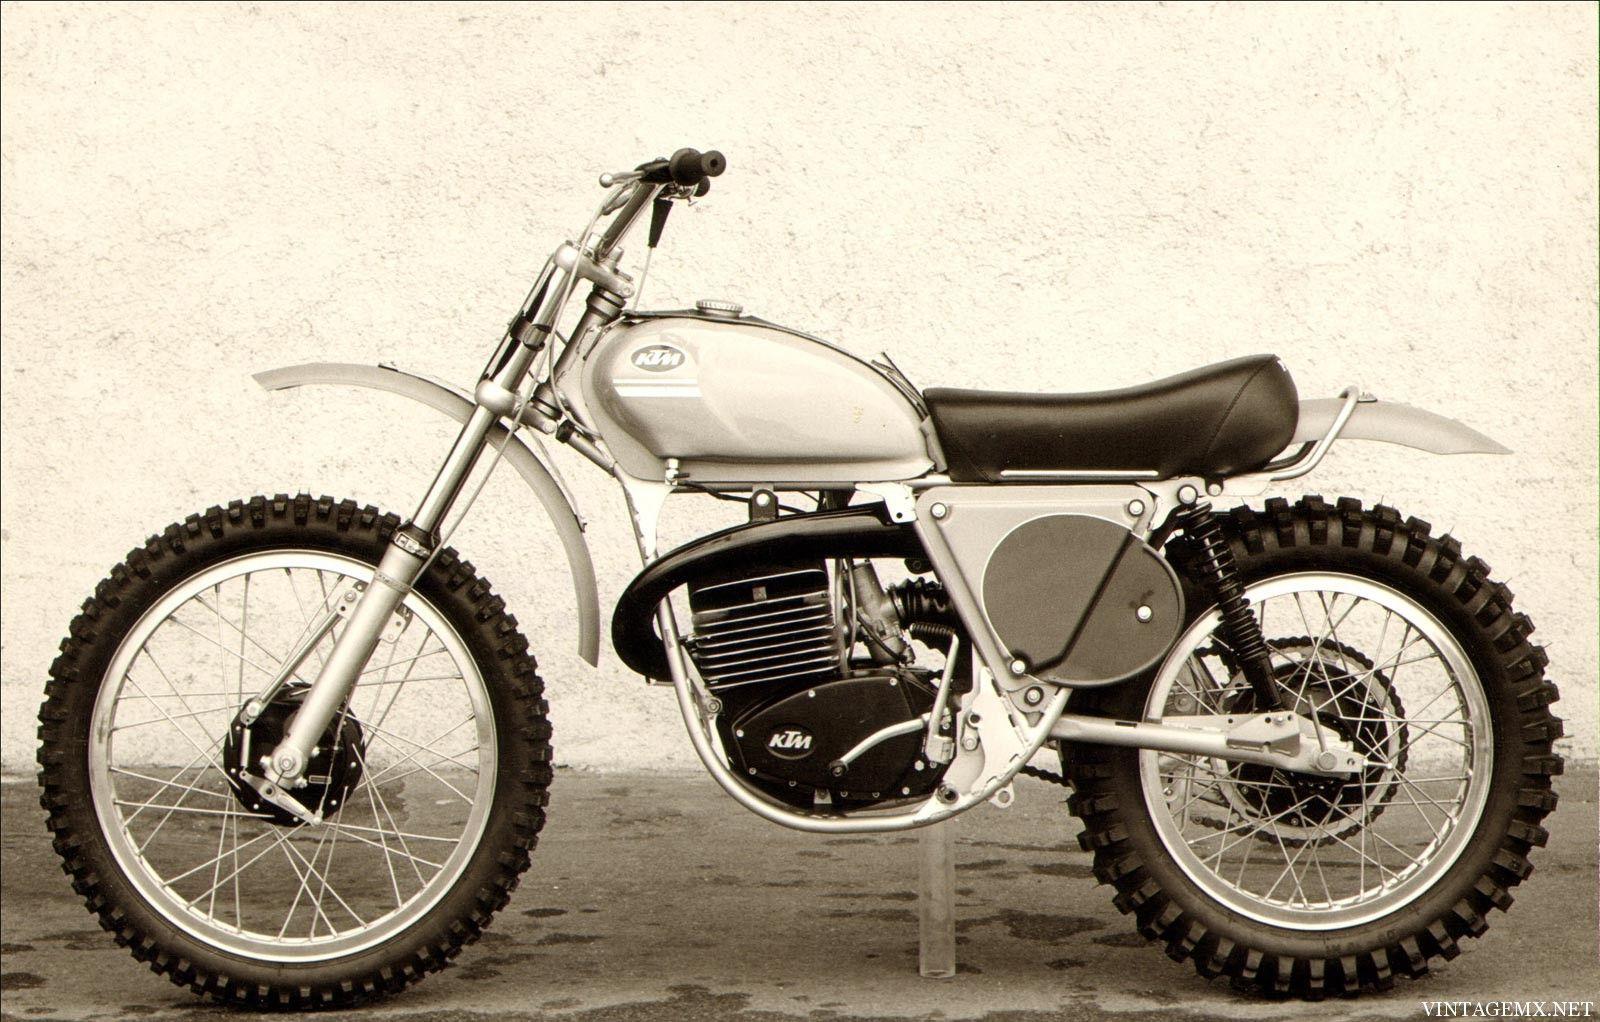 Vintage Ktm Motorcycles Ktm History Information Ktm Ktm 250 Tracker Motorcycle